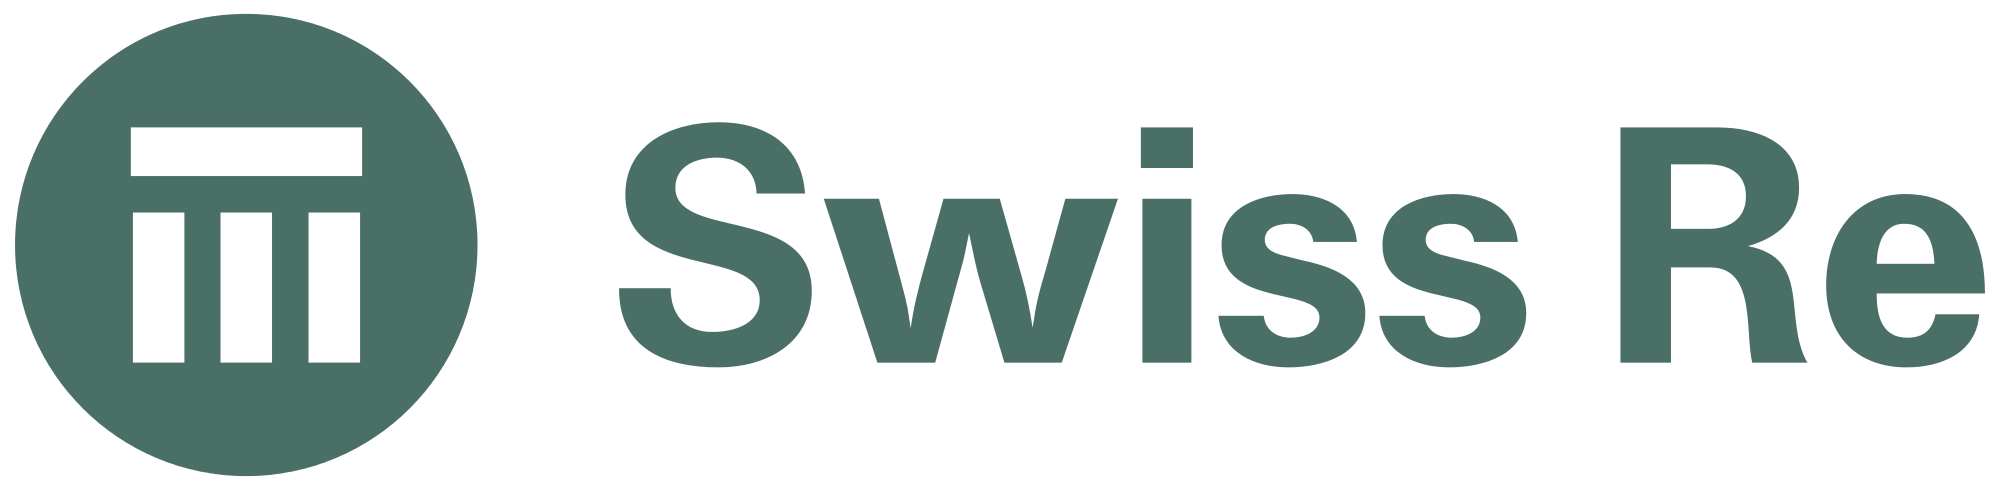 IBM Cloud Computing for Builders \u0026 Innovators - Belgium/Luxembourg